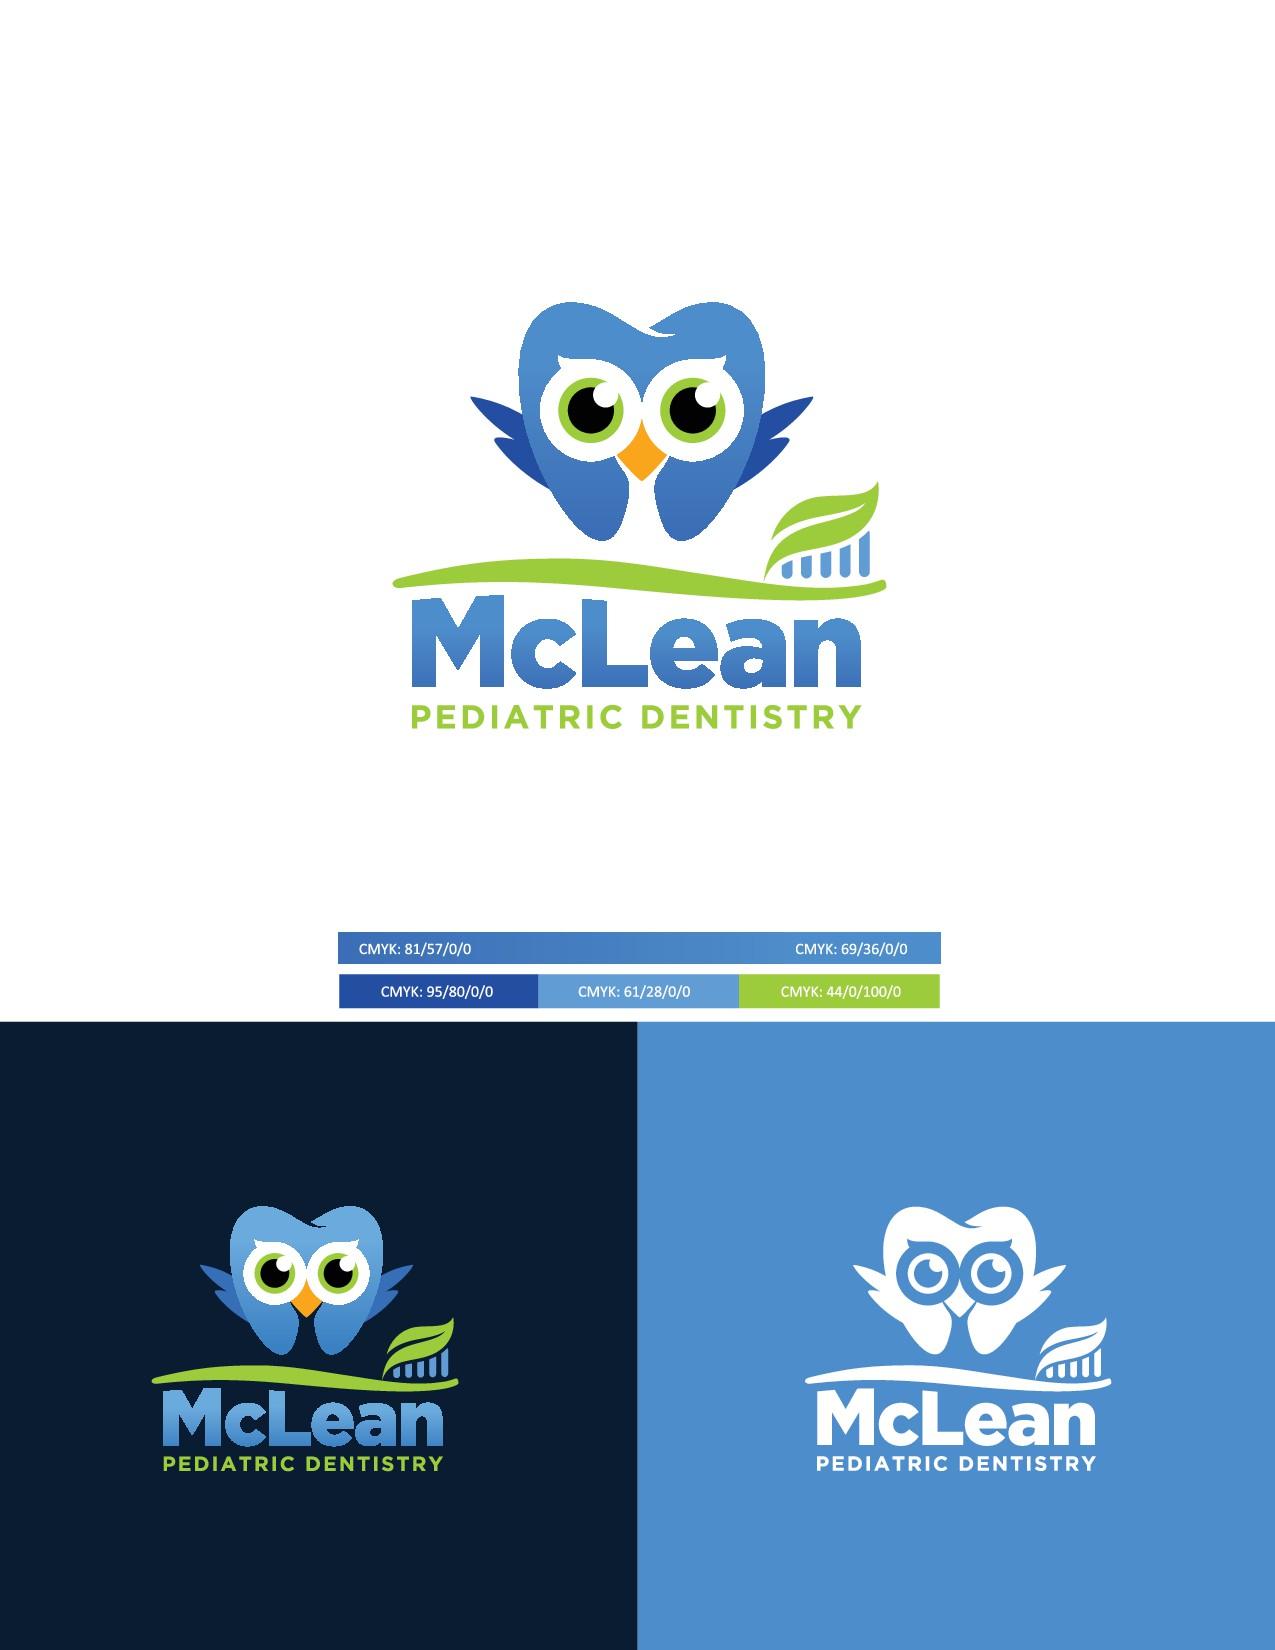 Fun Colorful Pediatric Dental Logo Needed :)